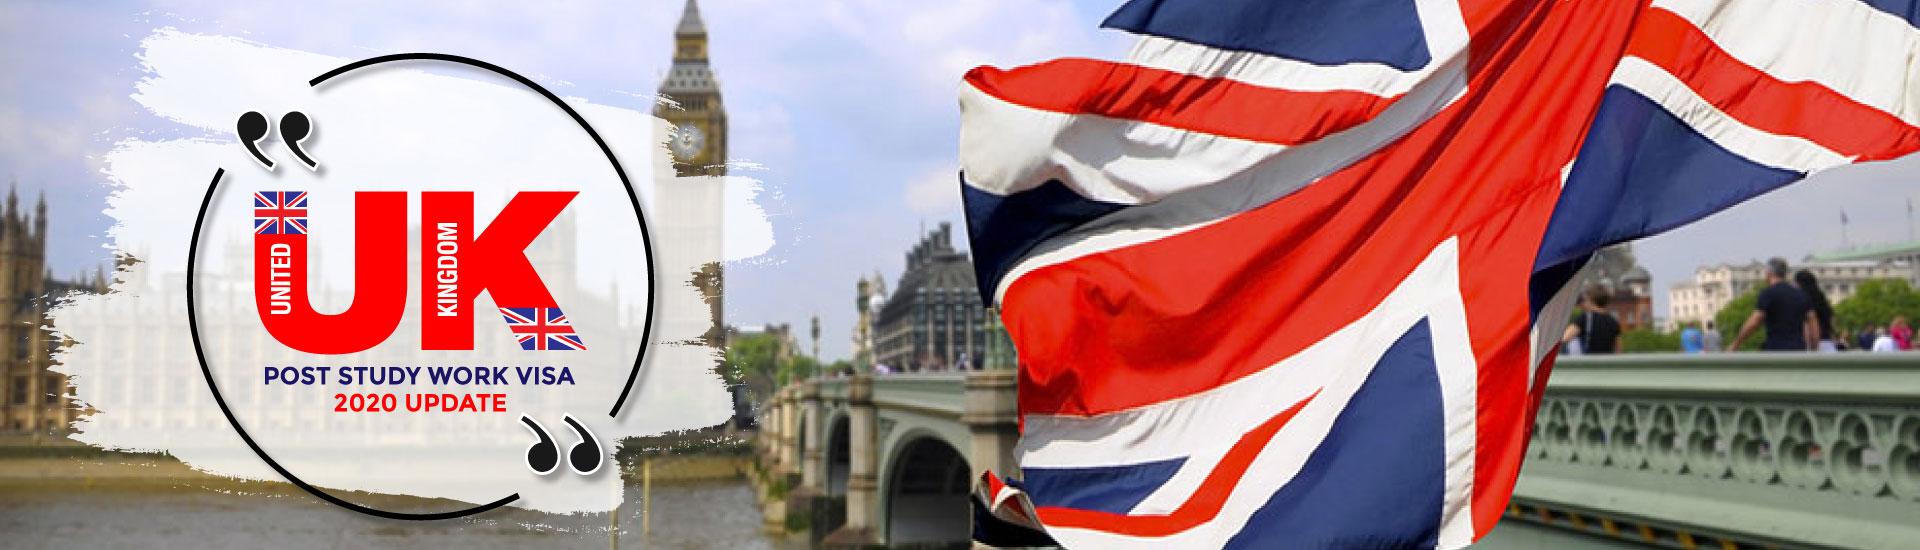 Study in the UK: Post-study work Visa update